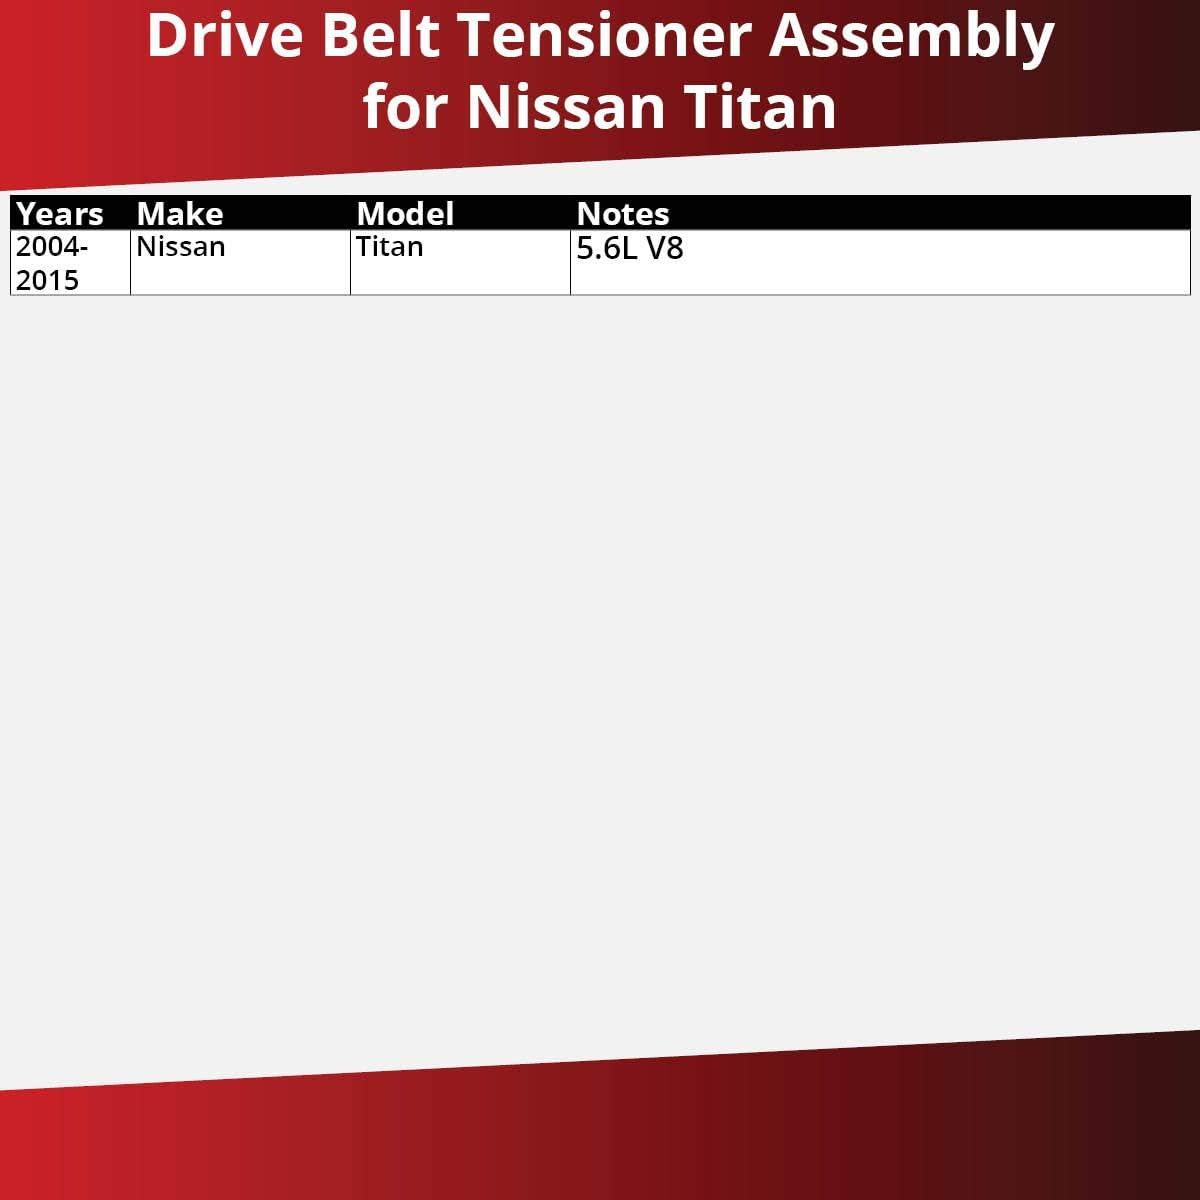 Tensioner Alternator Pump Accessory System Dayco Drive Belt Pulley for 2004-2015 Nissan Titan 5.6L V8